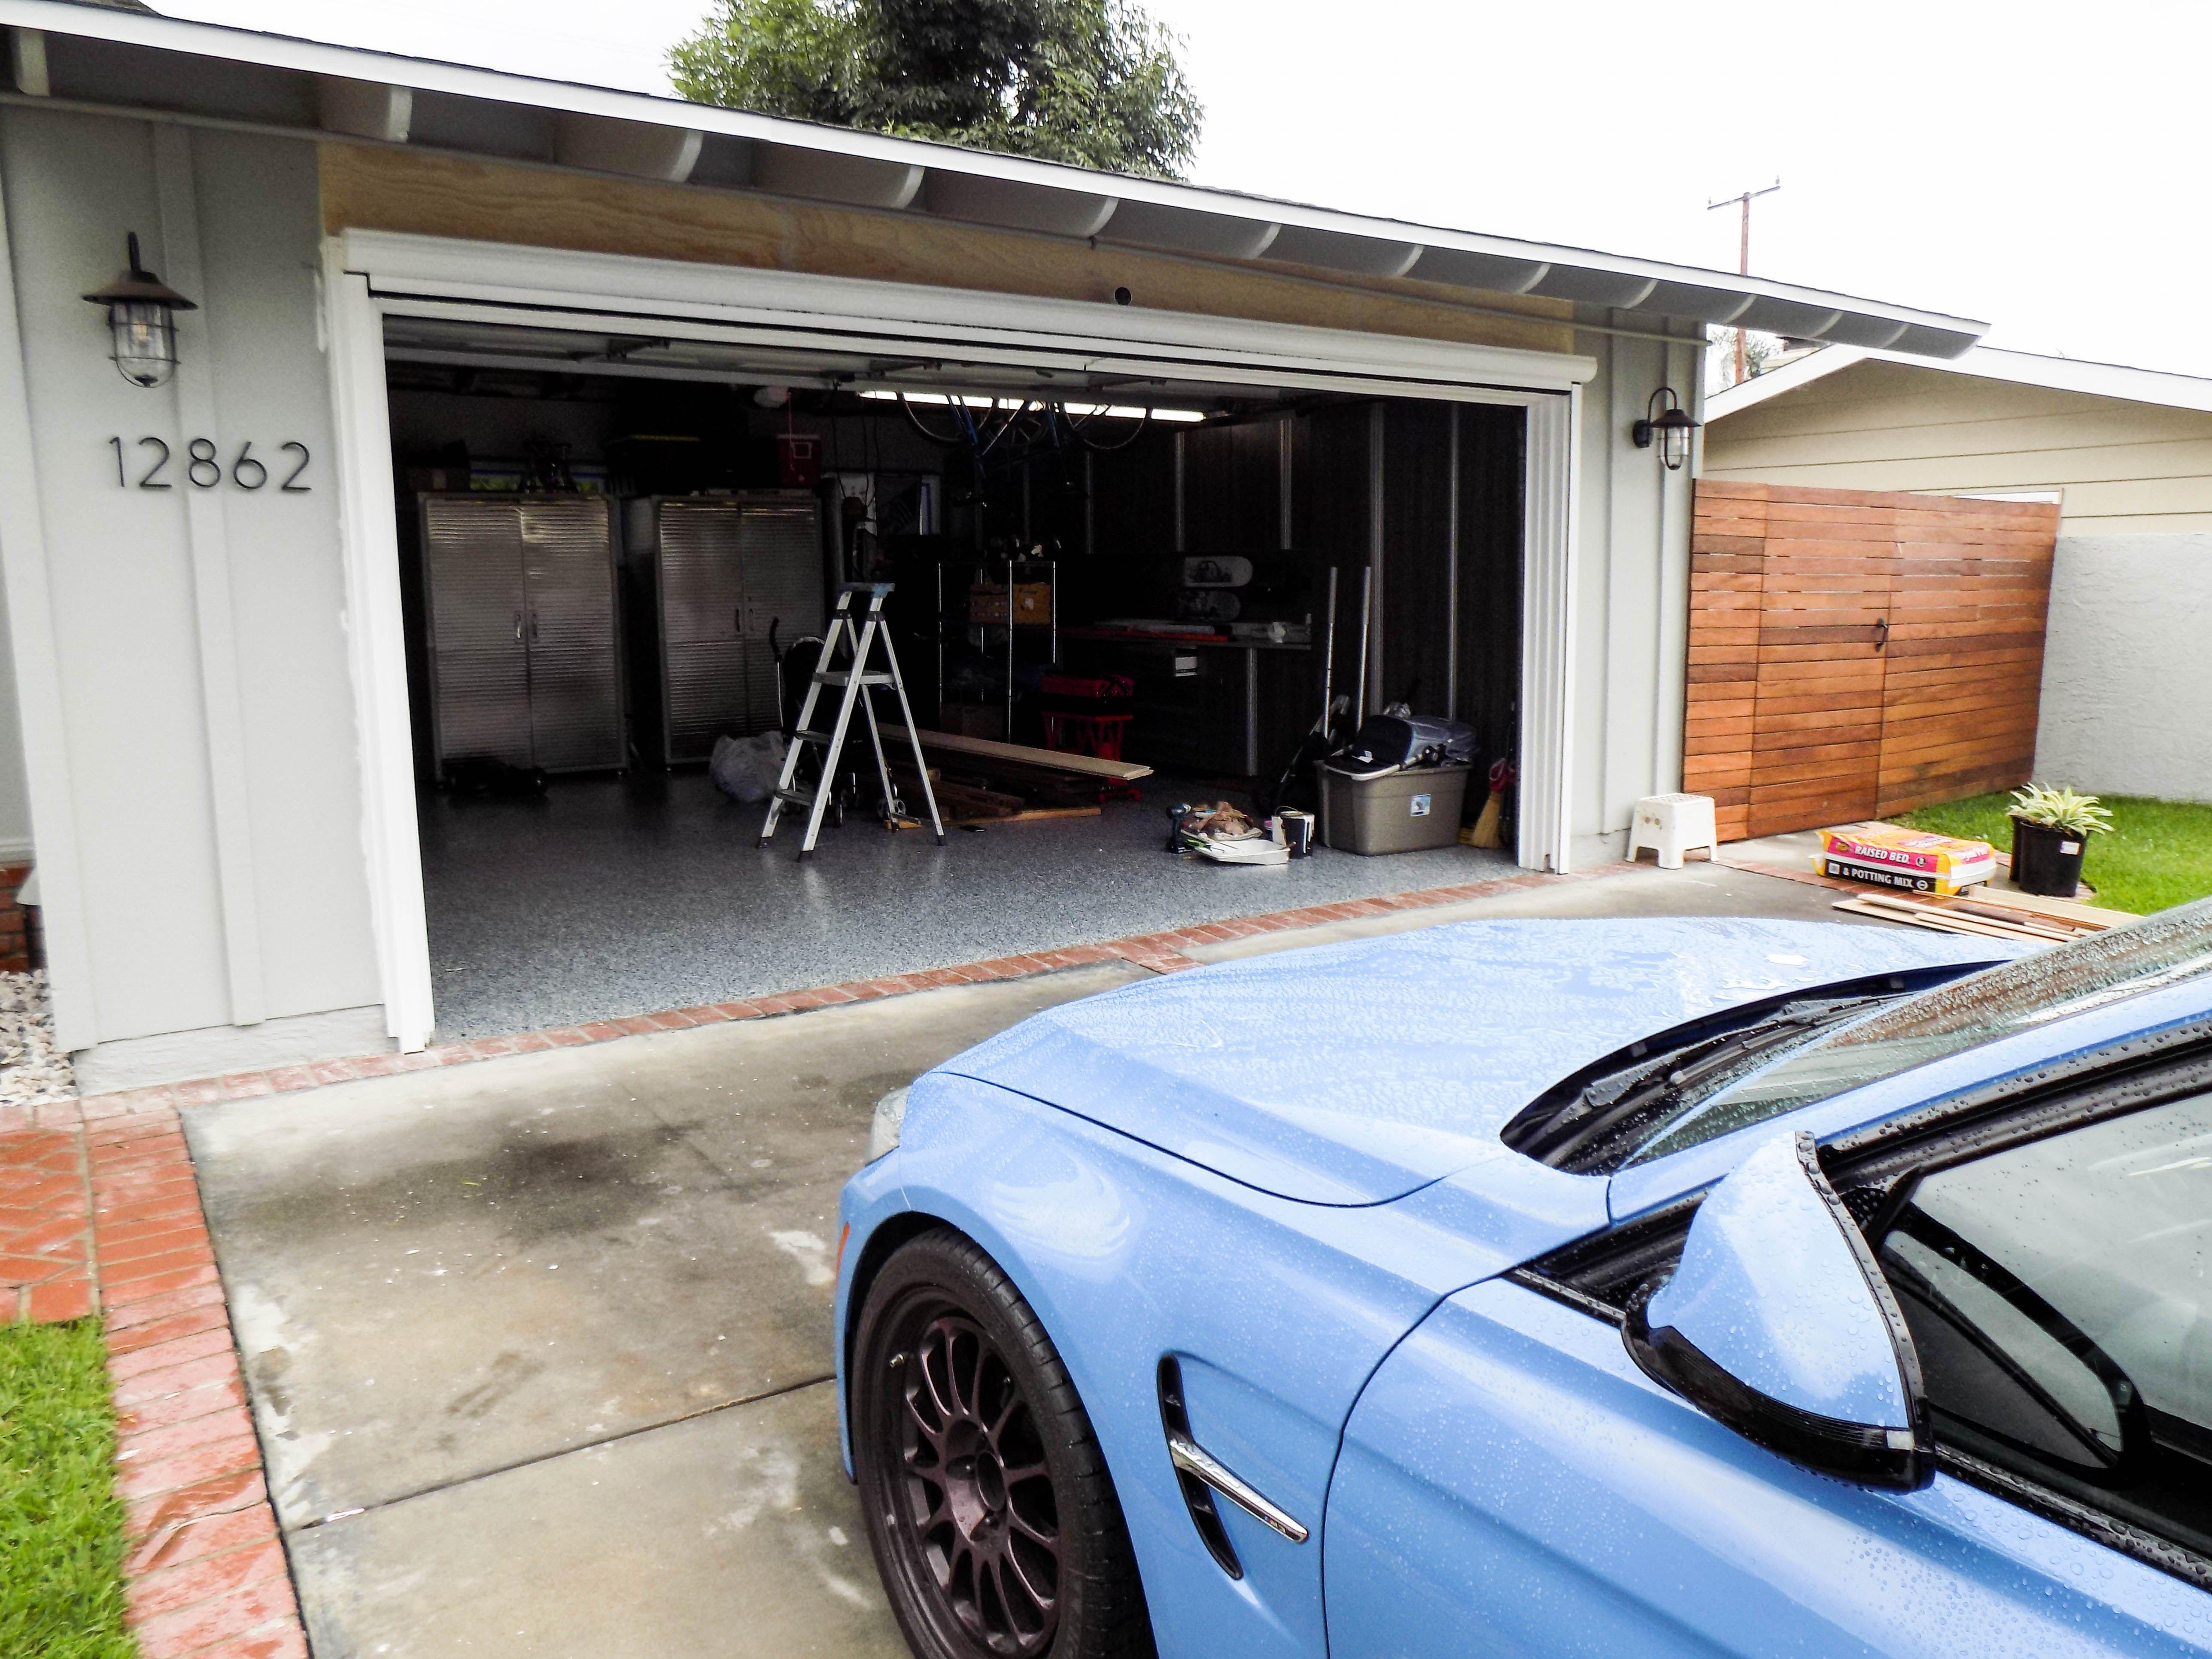 Leave Your Garage Door Open Without Compromising Your Privacy A Custom Built Motorized Power Scree Palos Verdes Estates Rancho Palos Verdes Garage Screen Door